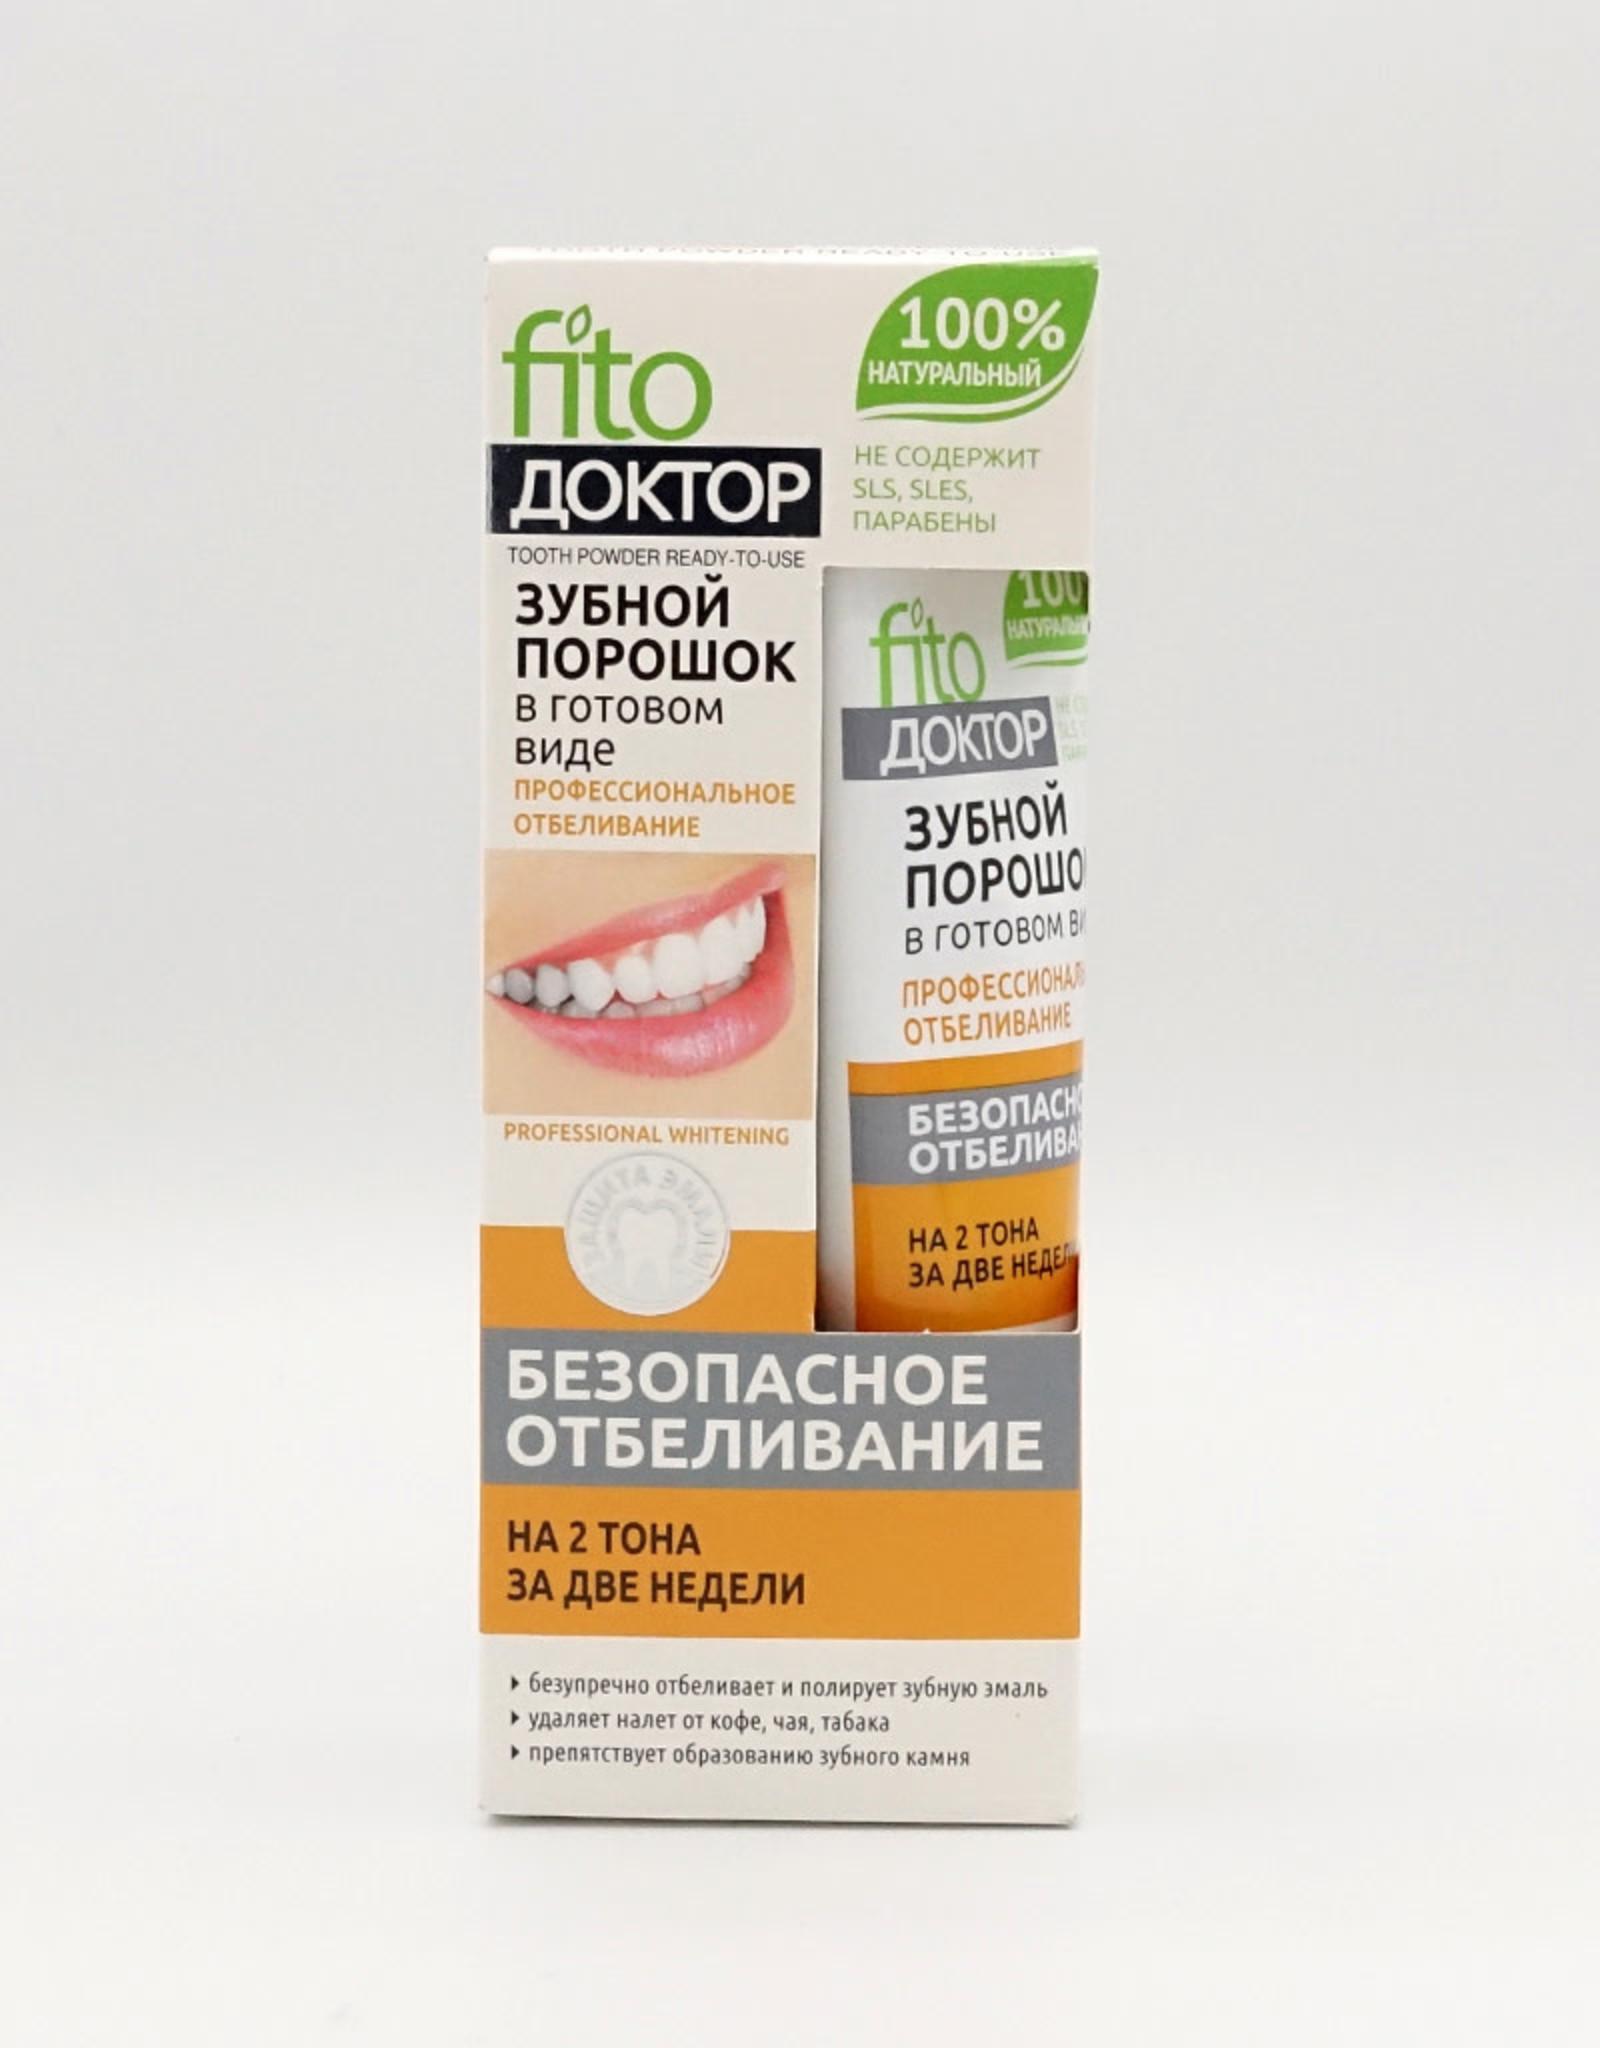 fito Доктор fito Доктор, Зубной Порошок, Отбеливание, На 2 тона